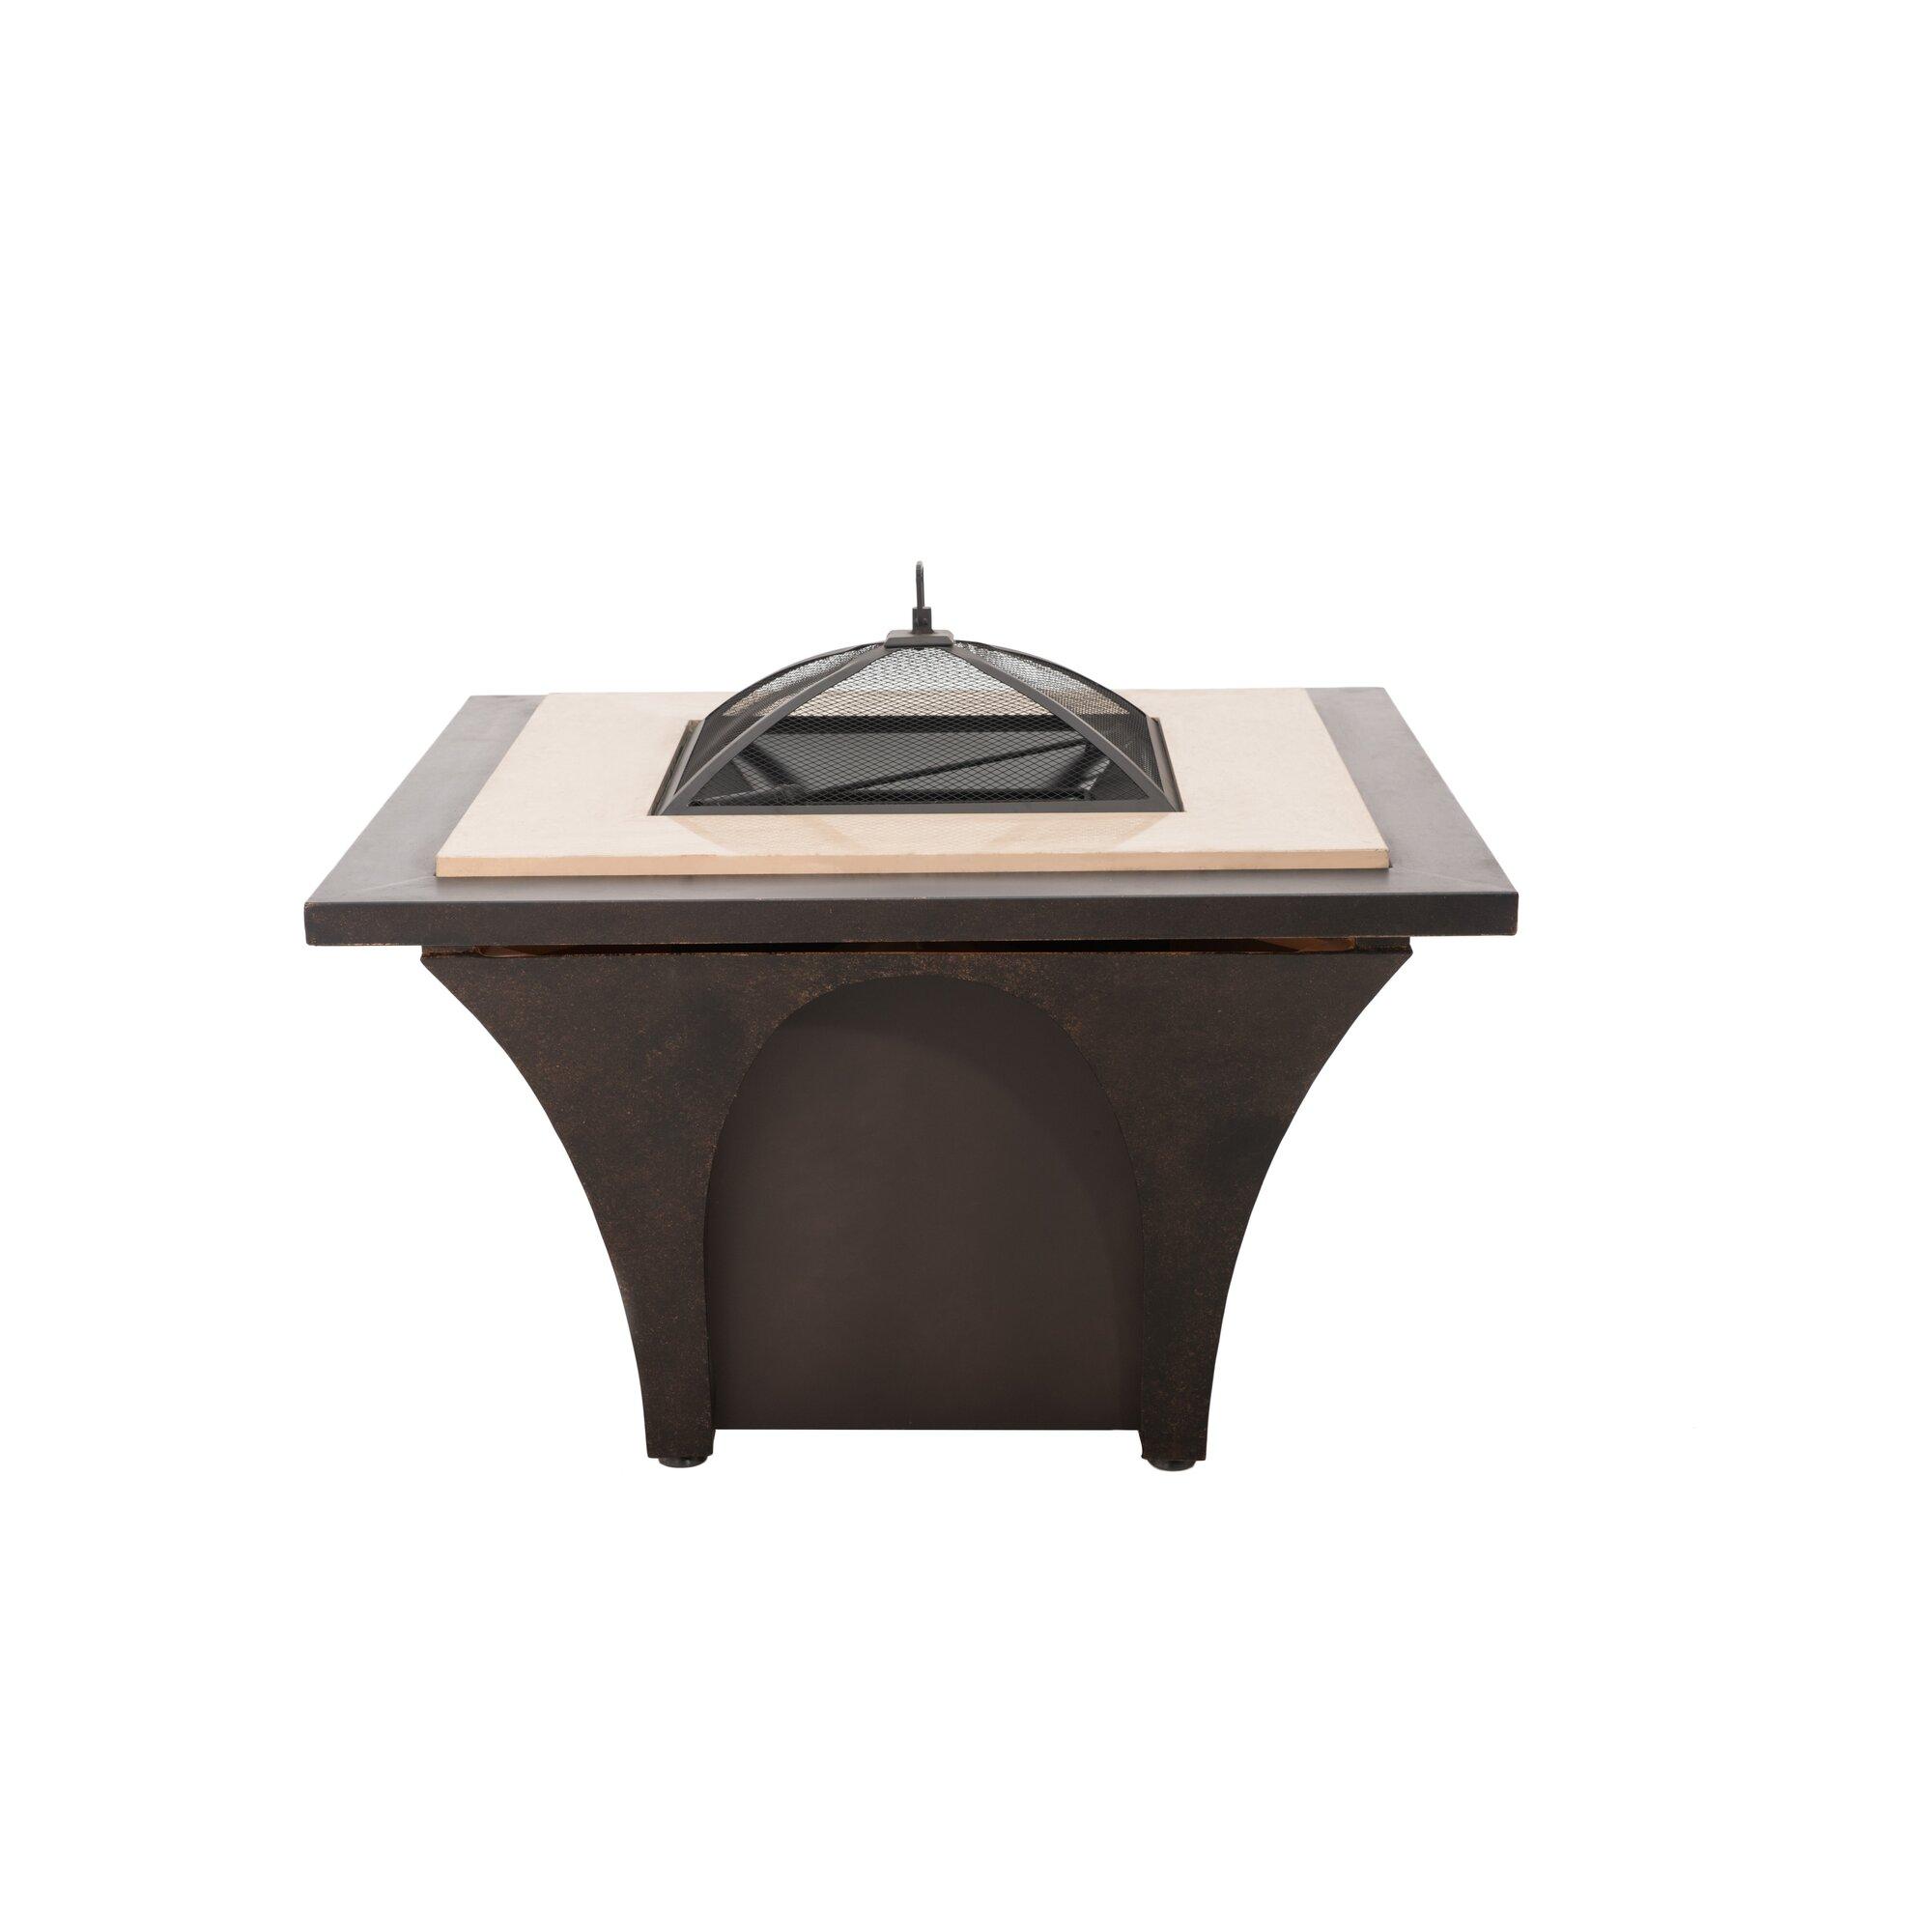 Sunjoy Revel Aluminum Wood Burning Fire Pit Table